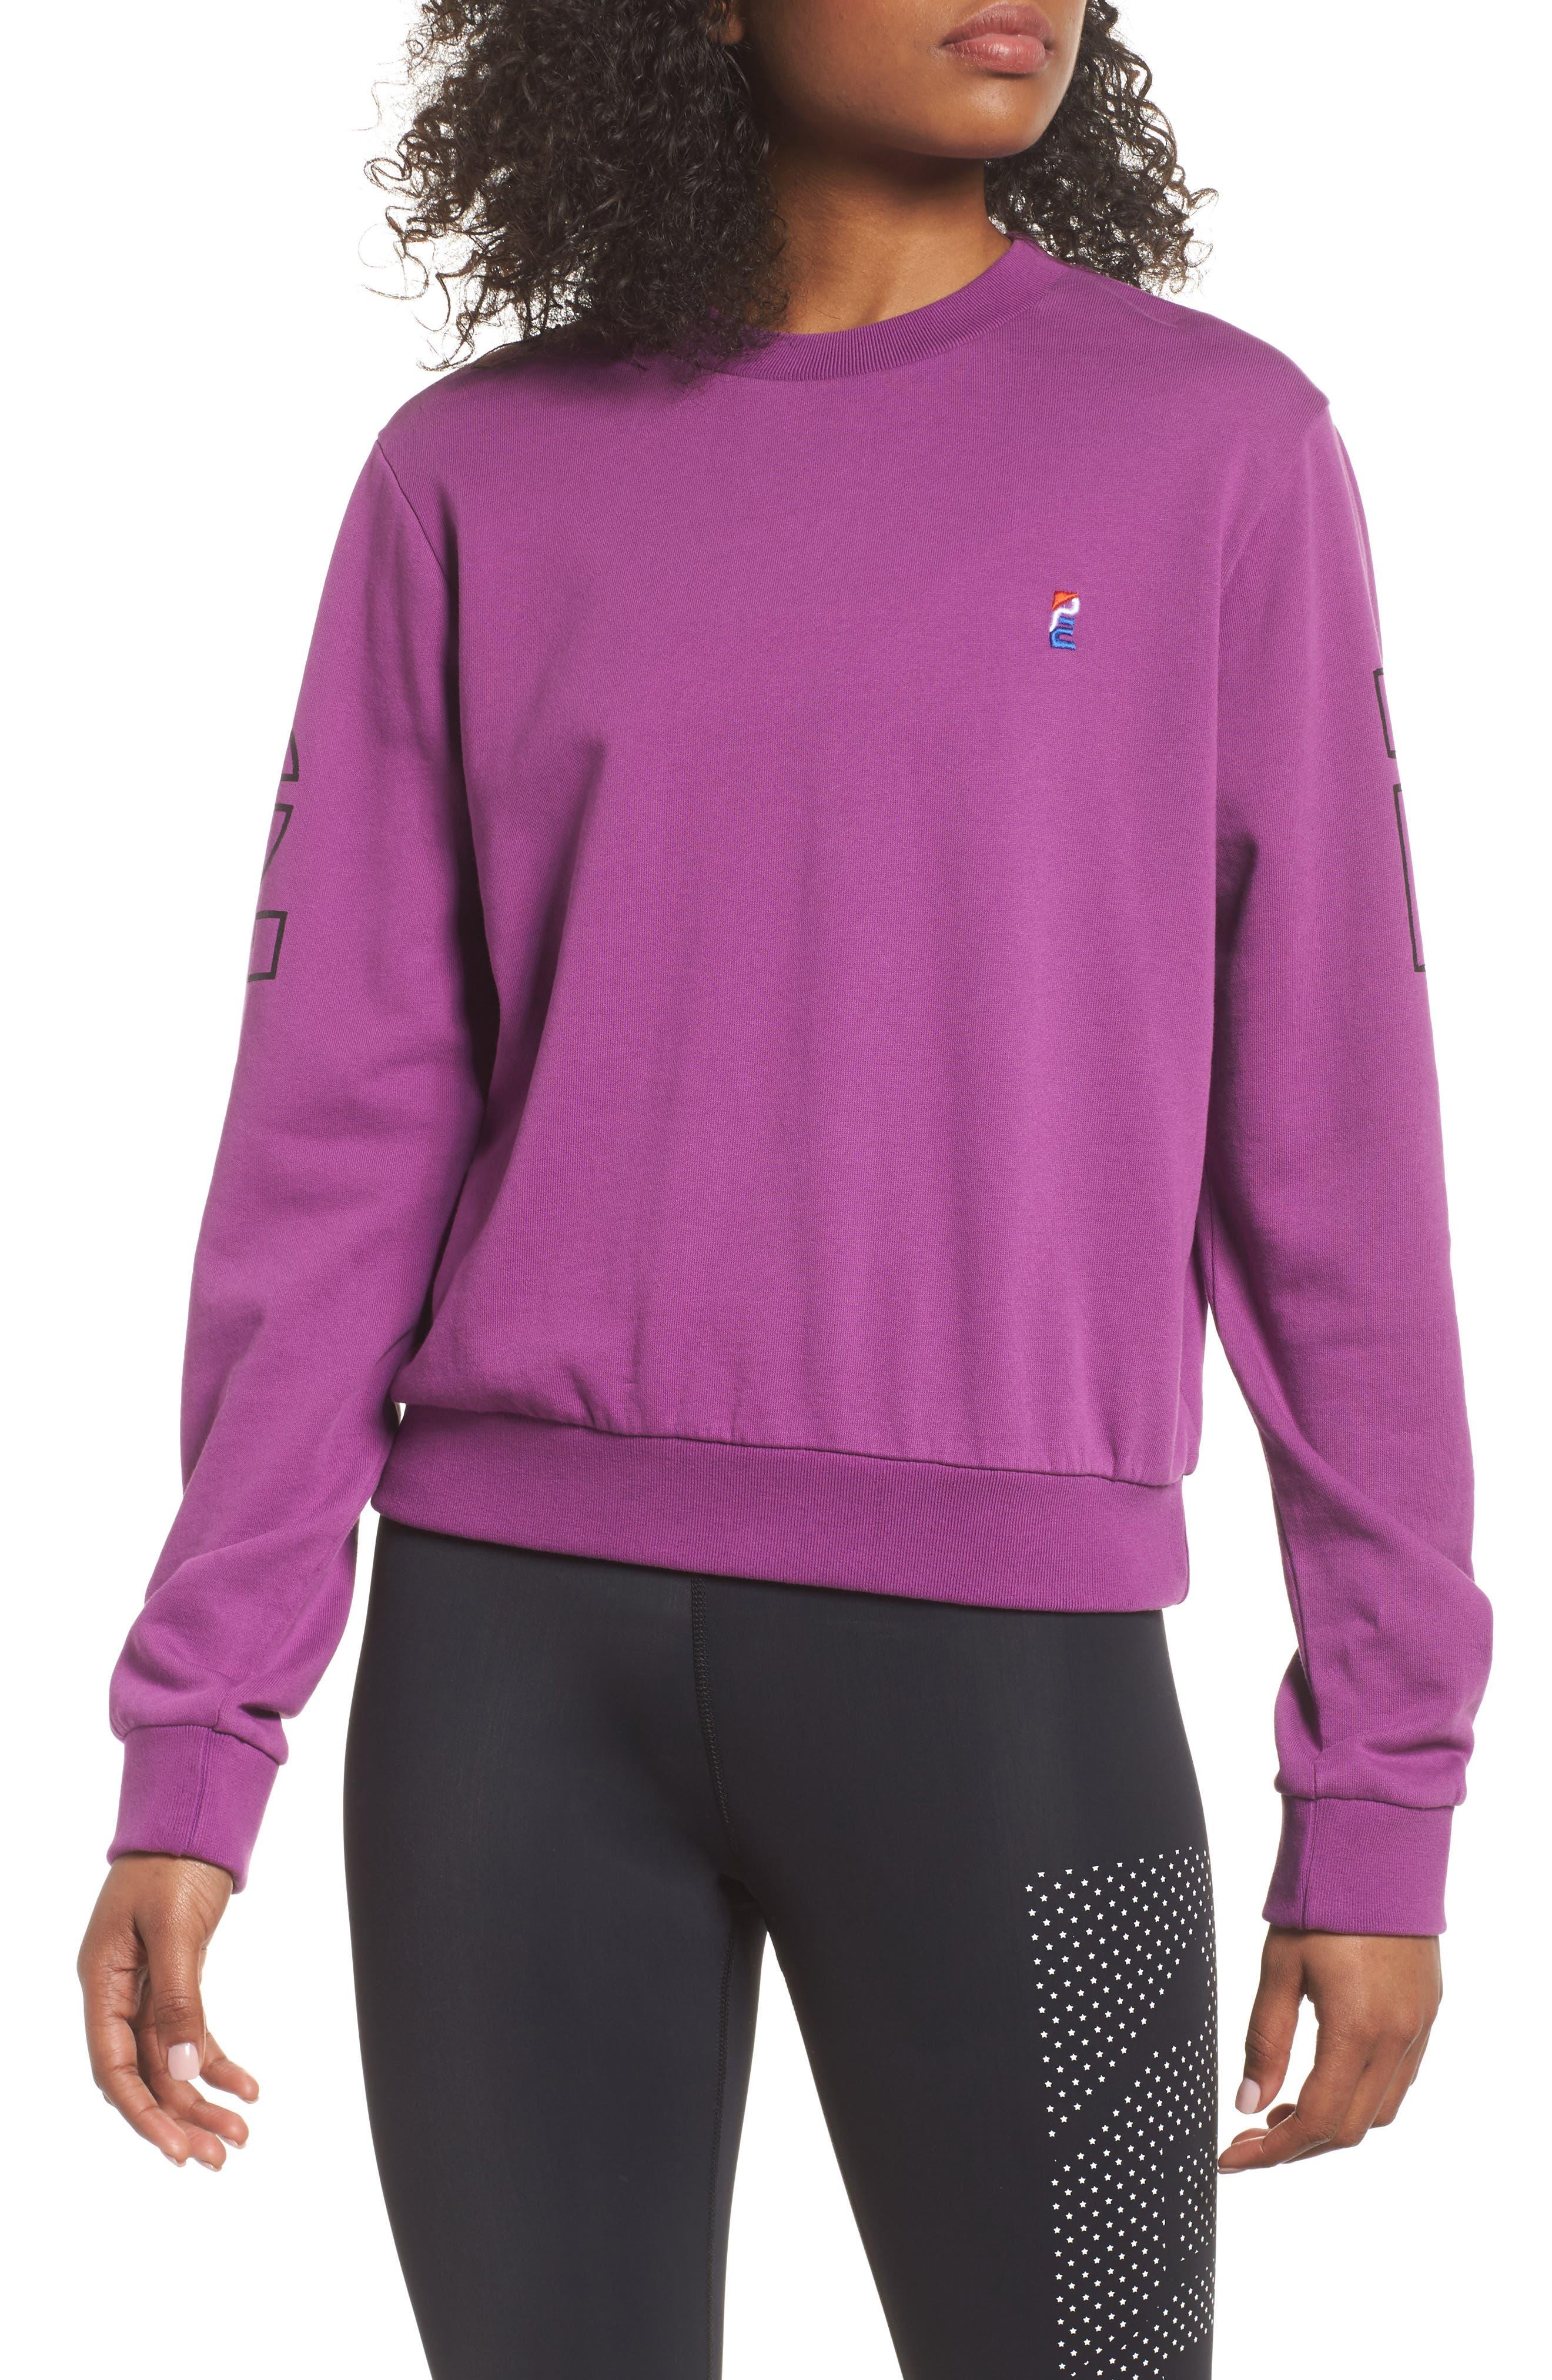 Moneyball Sweatshirt,                         Main,                         color, 500